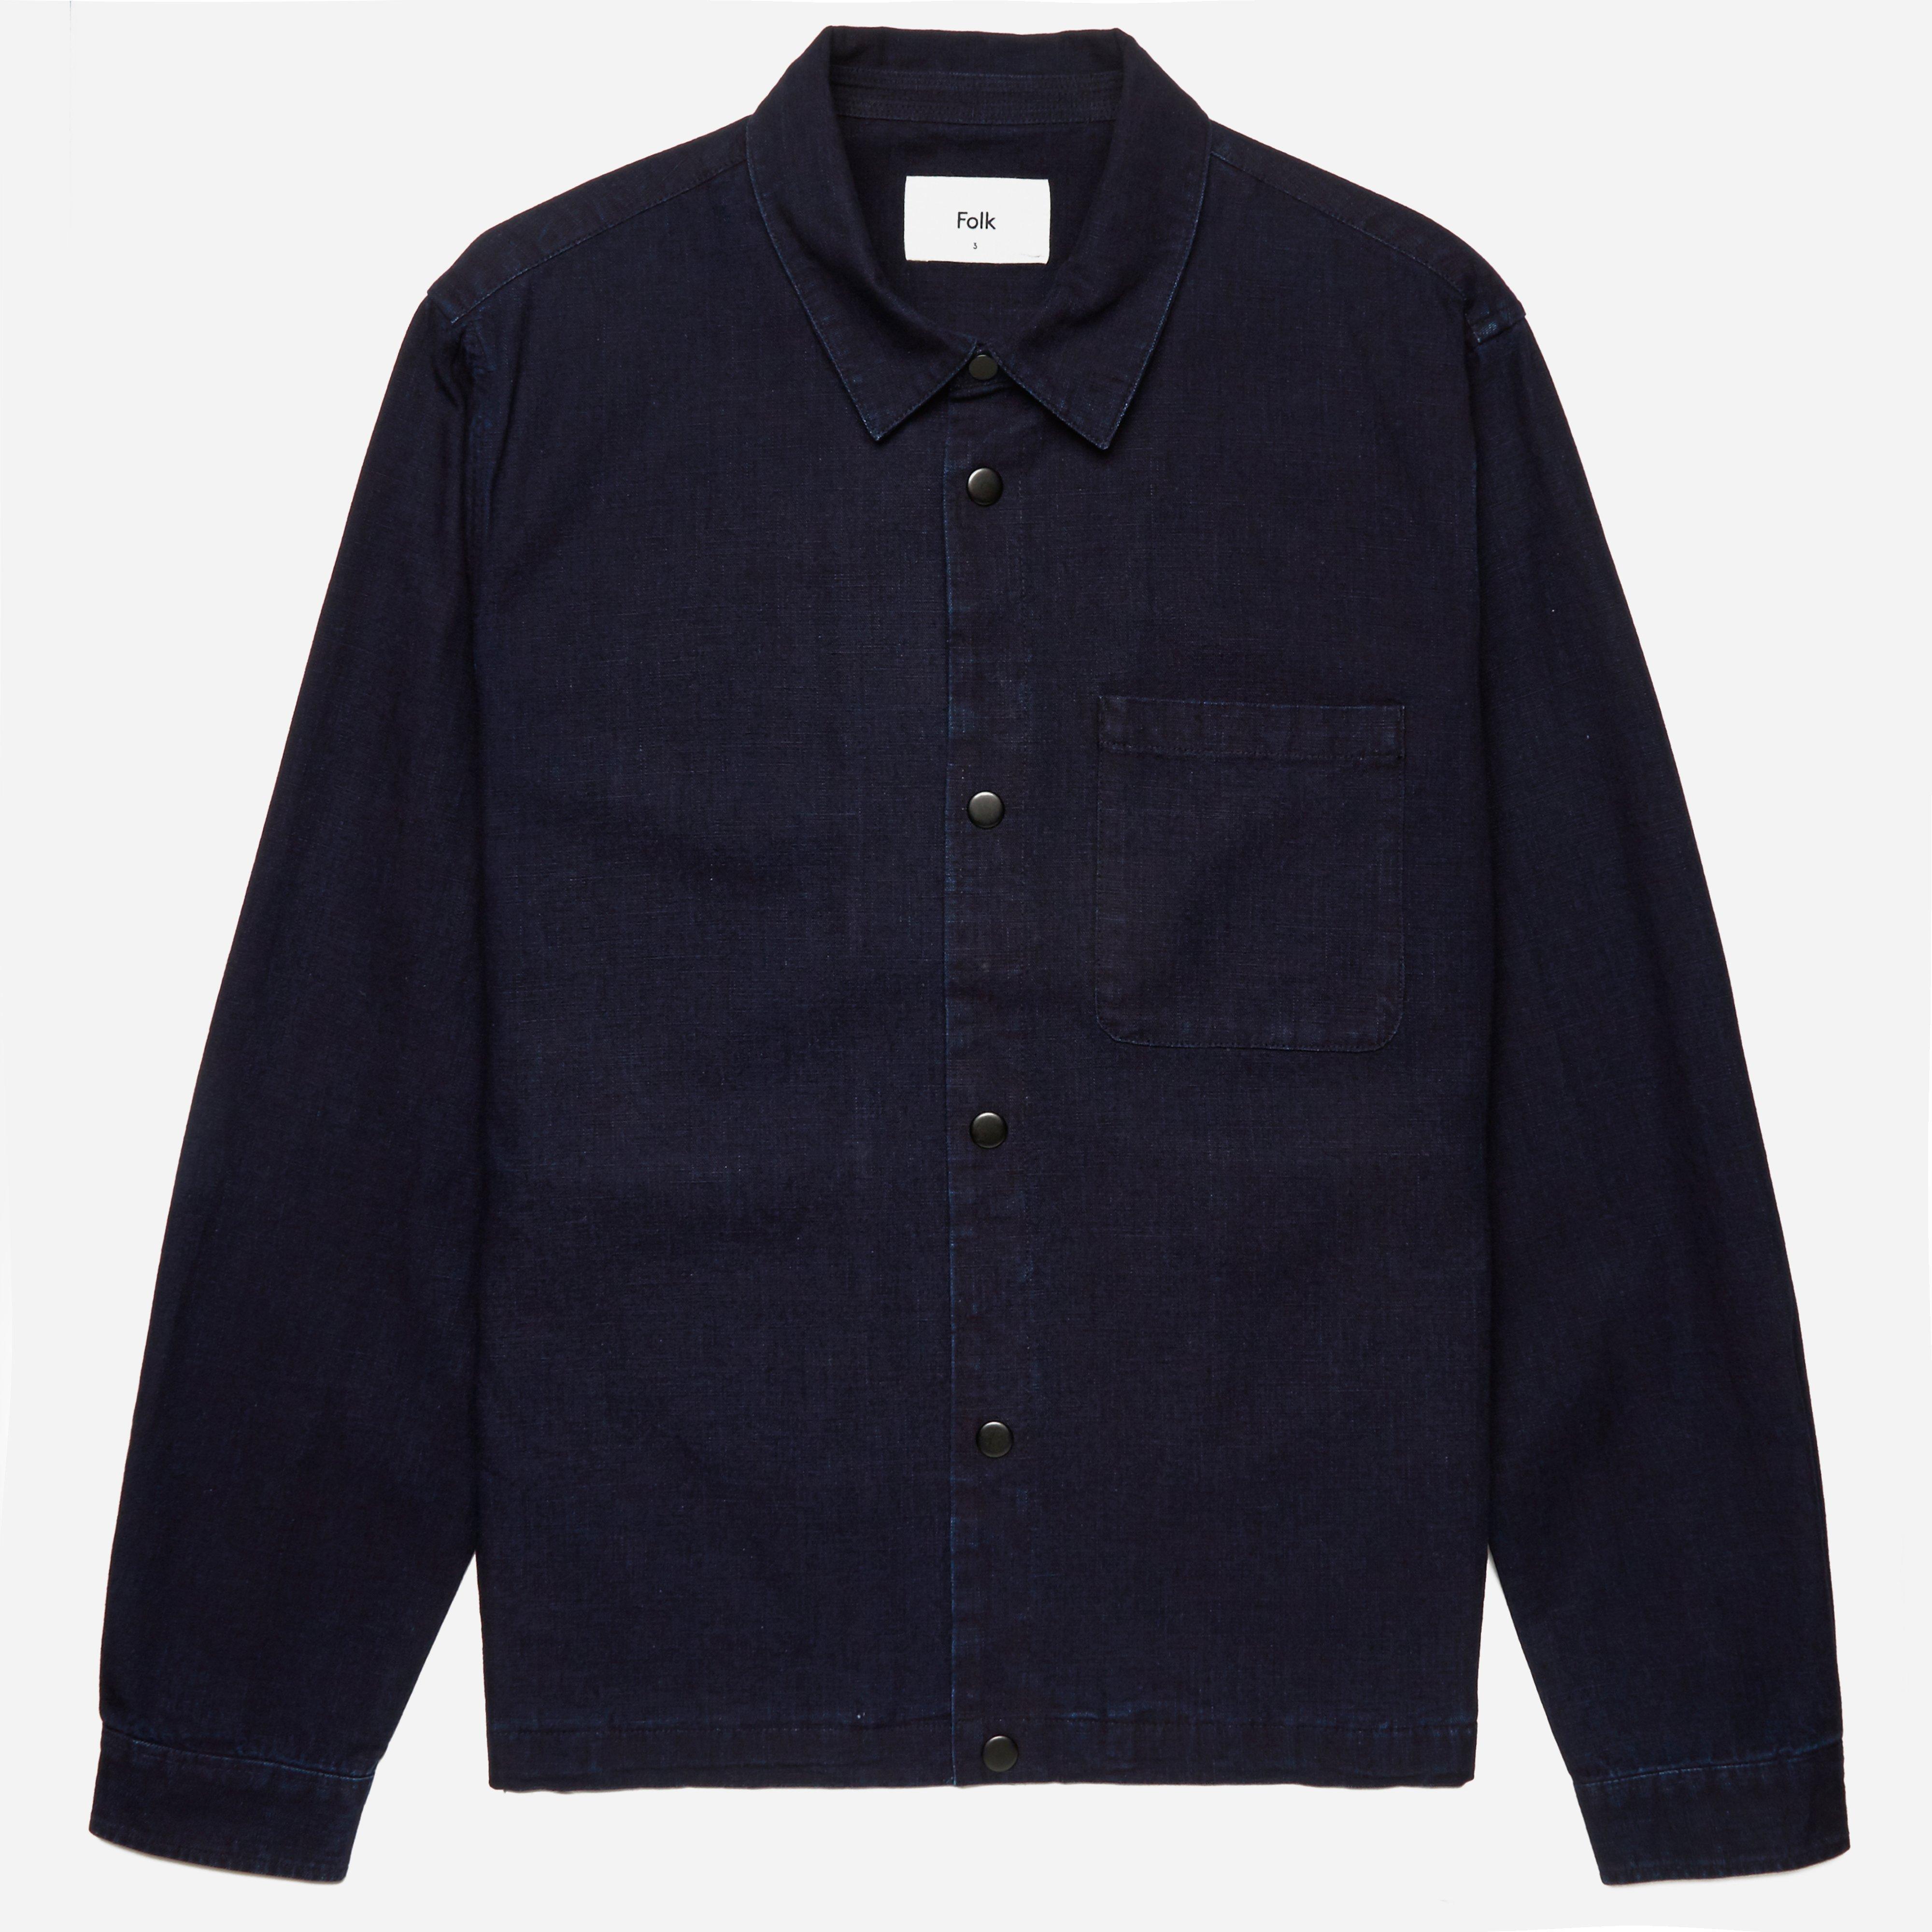 Folk Orb Jacket